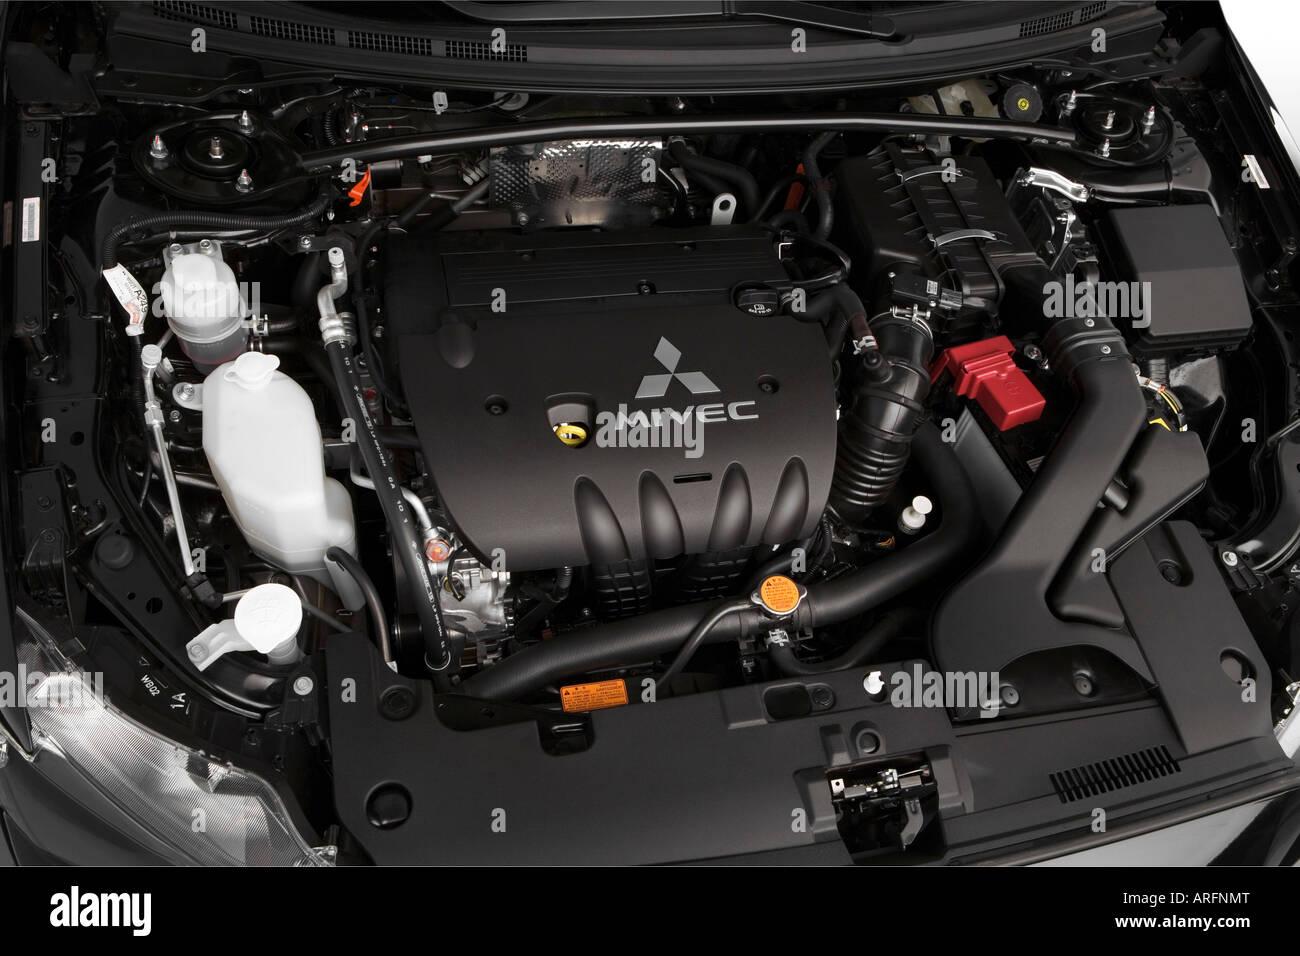 2008 mitsubishi lancer gts in schwarz - motor stockfoto, bild